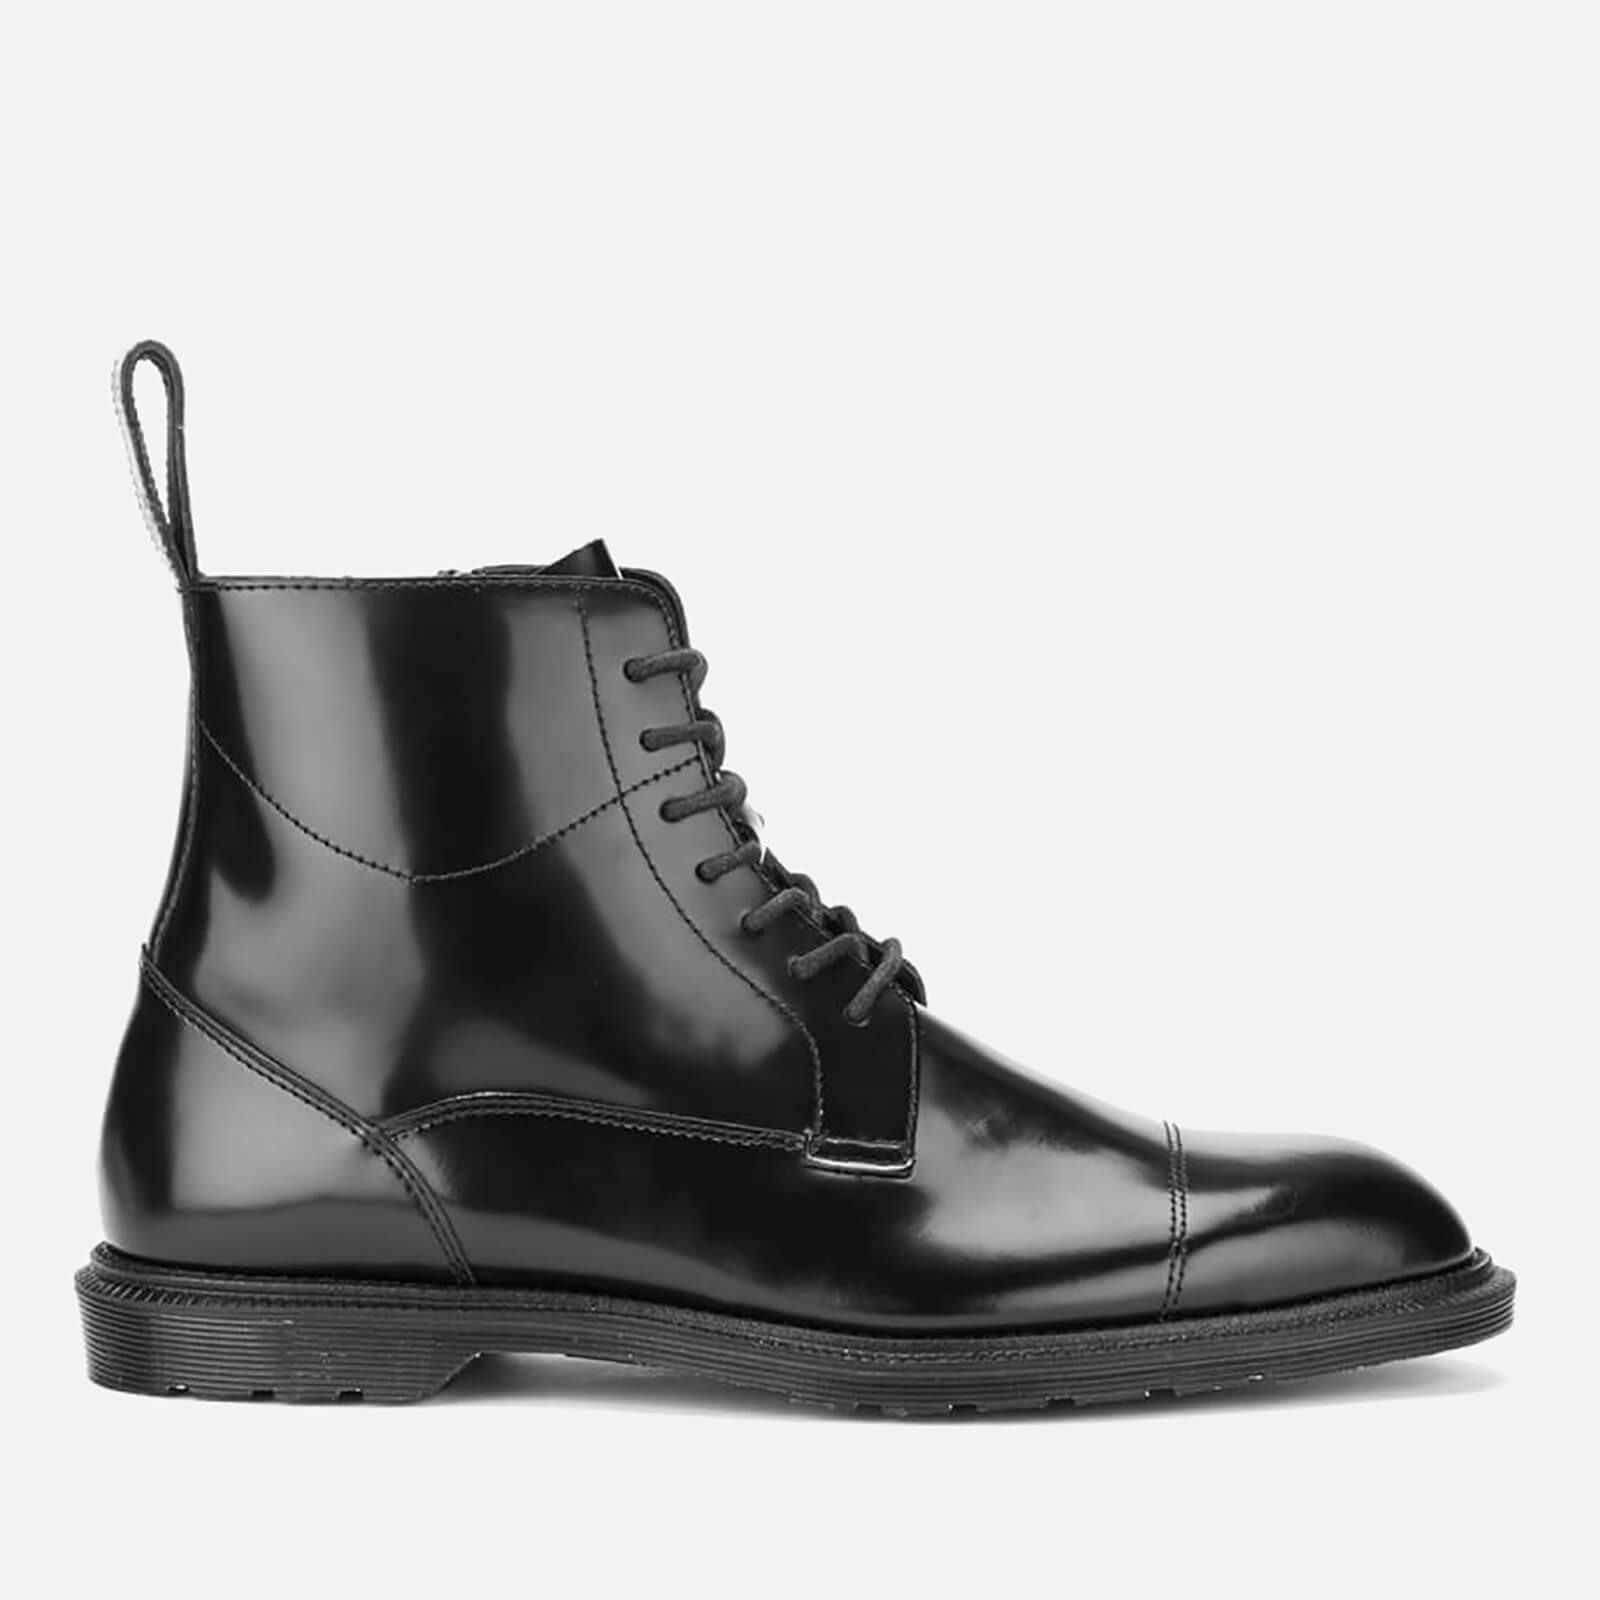 Dr. Martens Herren Winchester Black Polished Smooth Stiefel